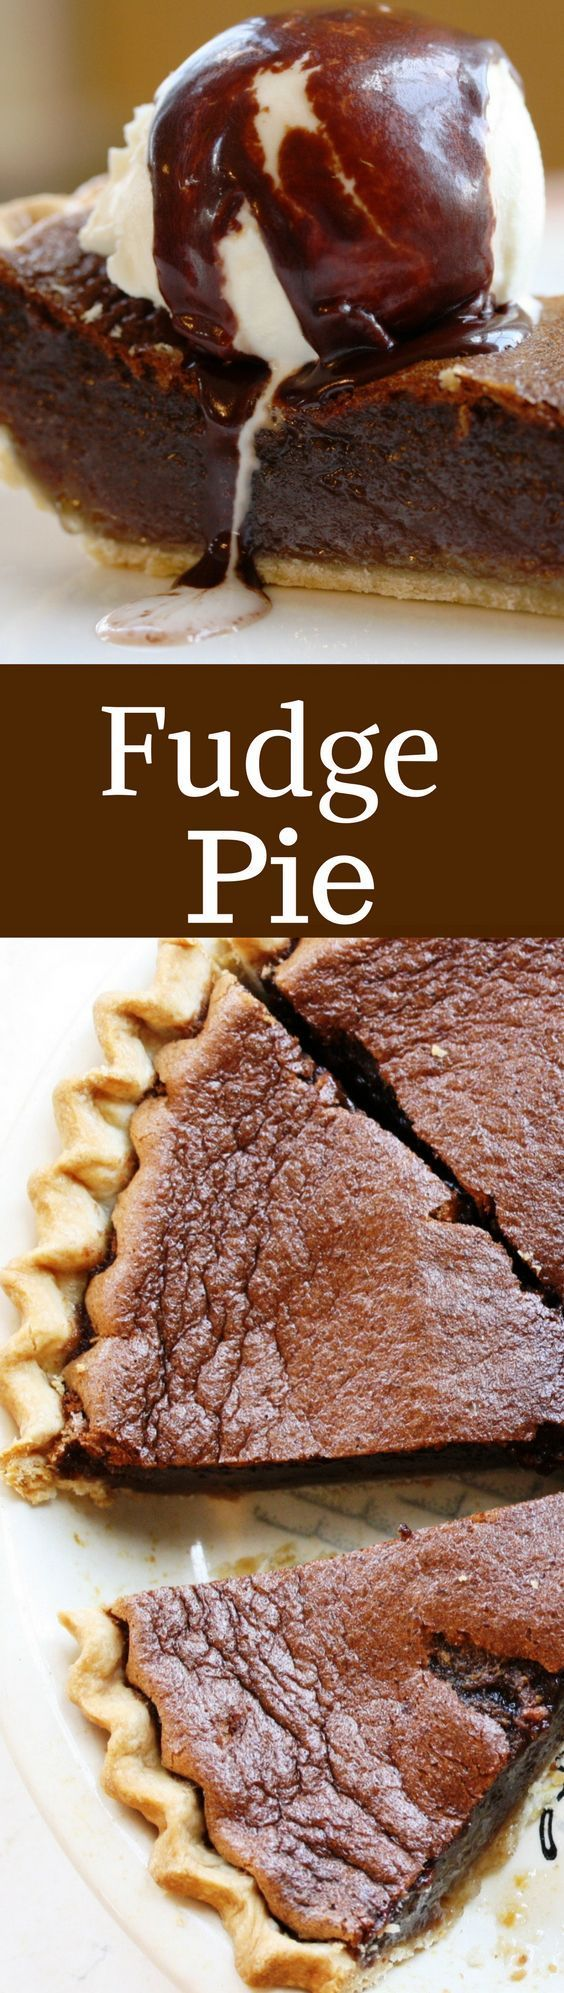 Top 25+ best Fudge pie ideas on Pinterest   Chocolate fudge pie ...